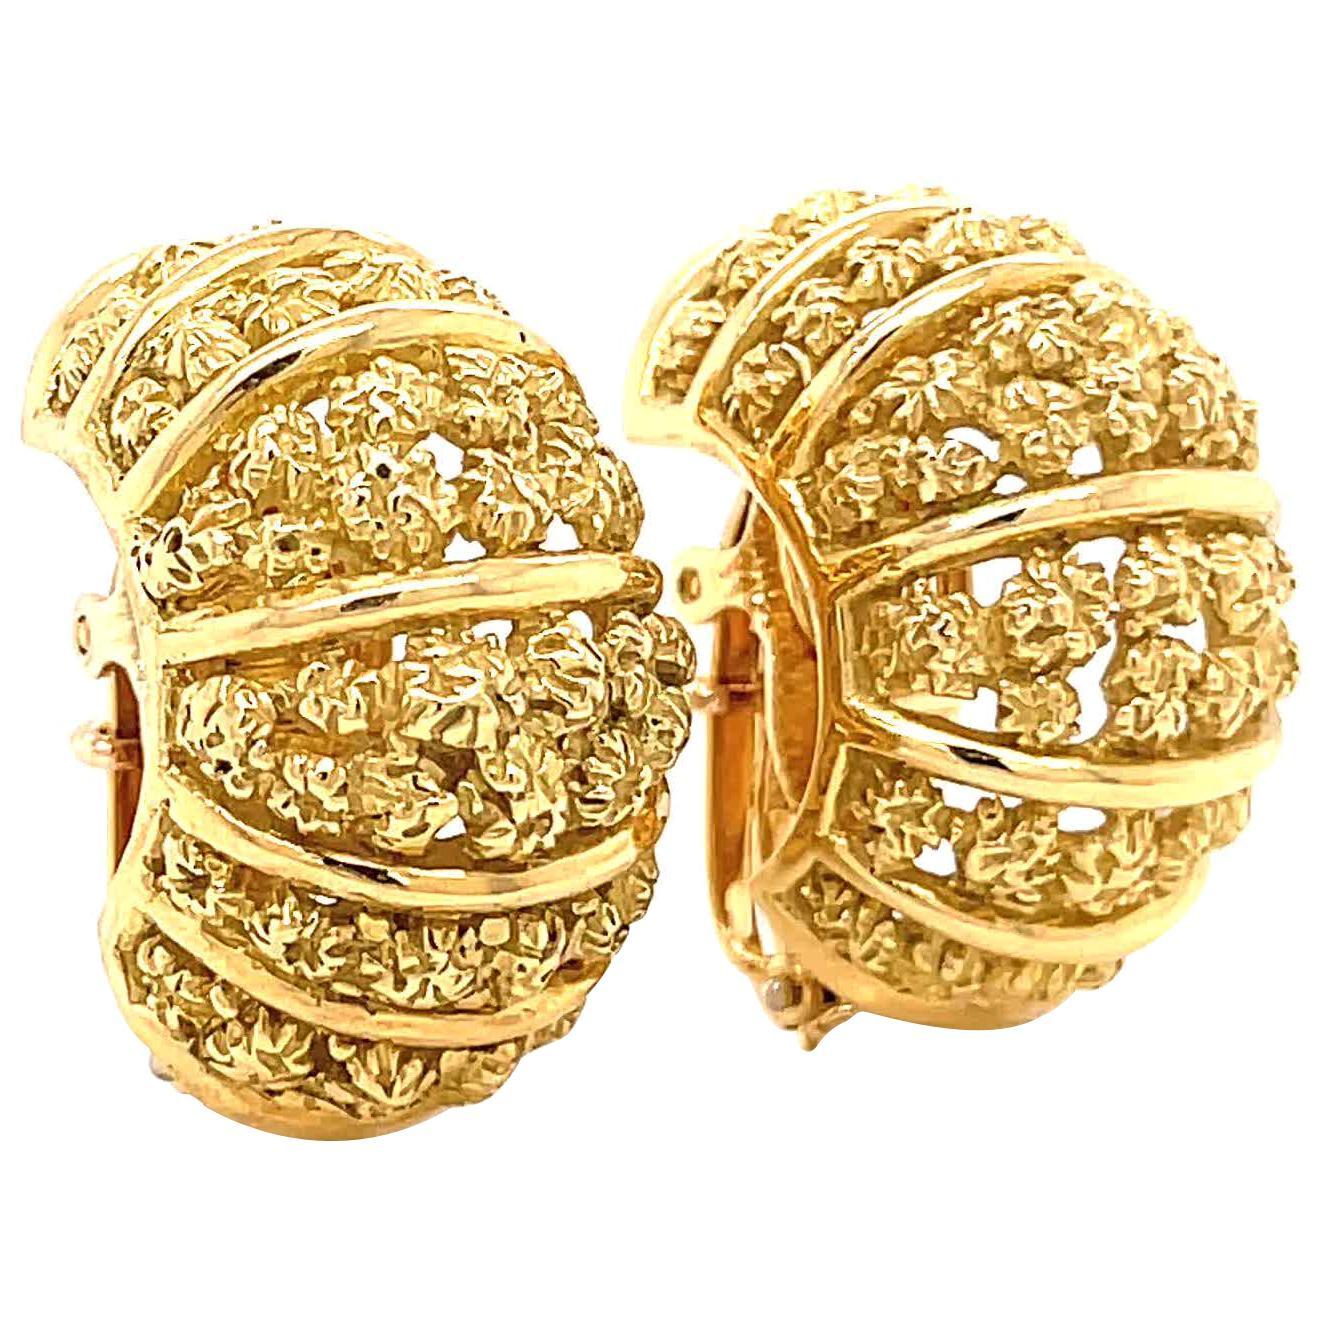 Vintage Tiffany & Co. Textured 18 Karat Gold Ear Clips